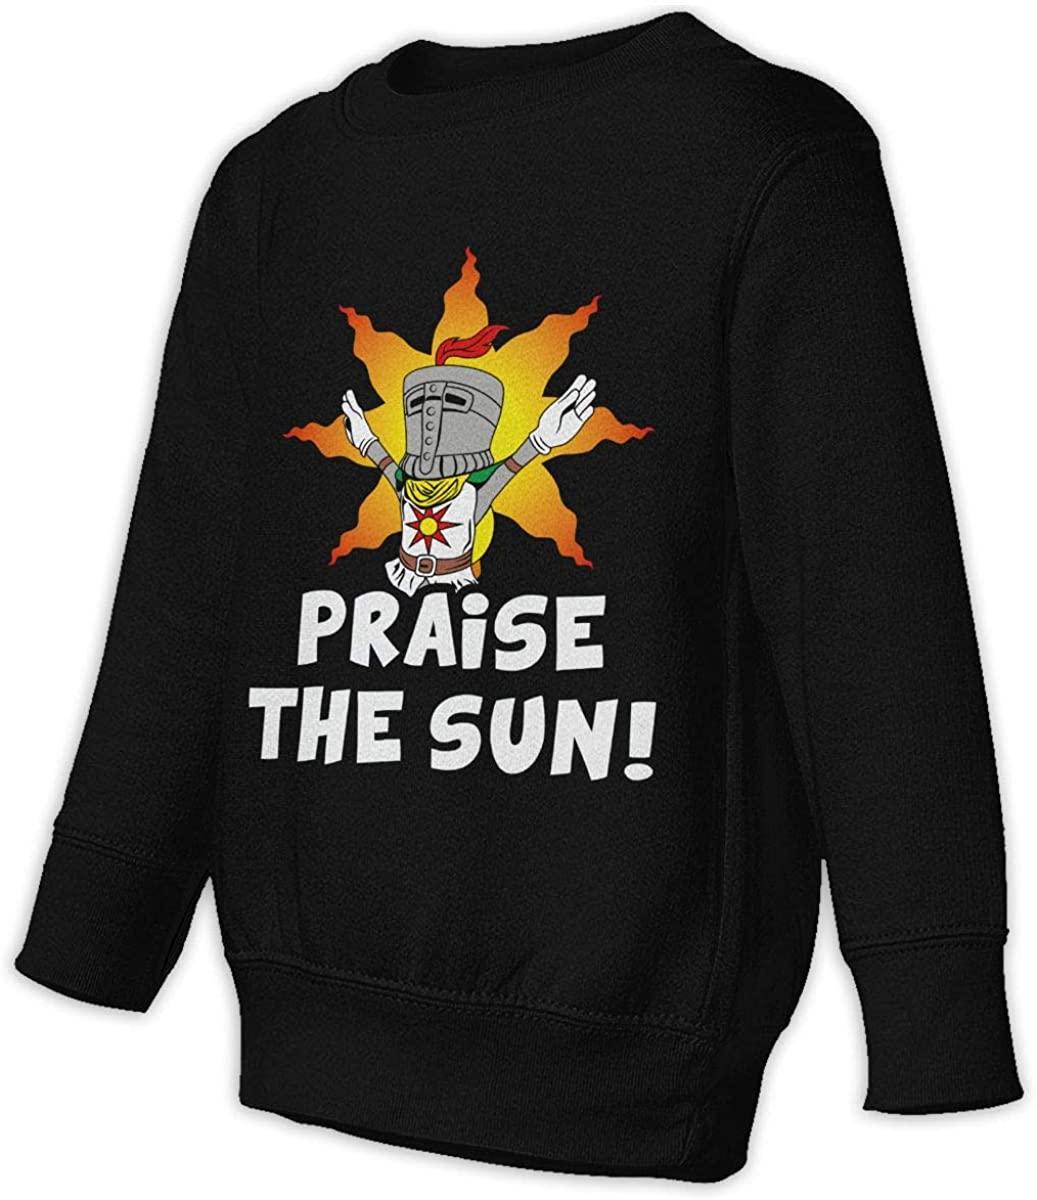 Praise The Sun Tarot Card Unisex Sweatshirt Youth Boy and Girls Pullover Sweatshirt Black